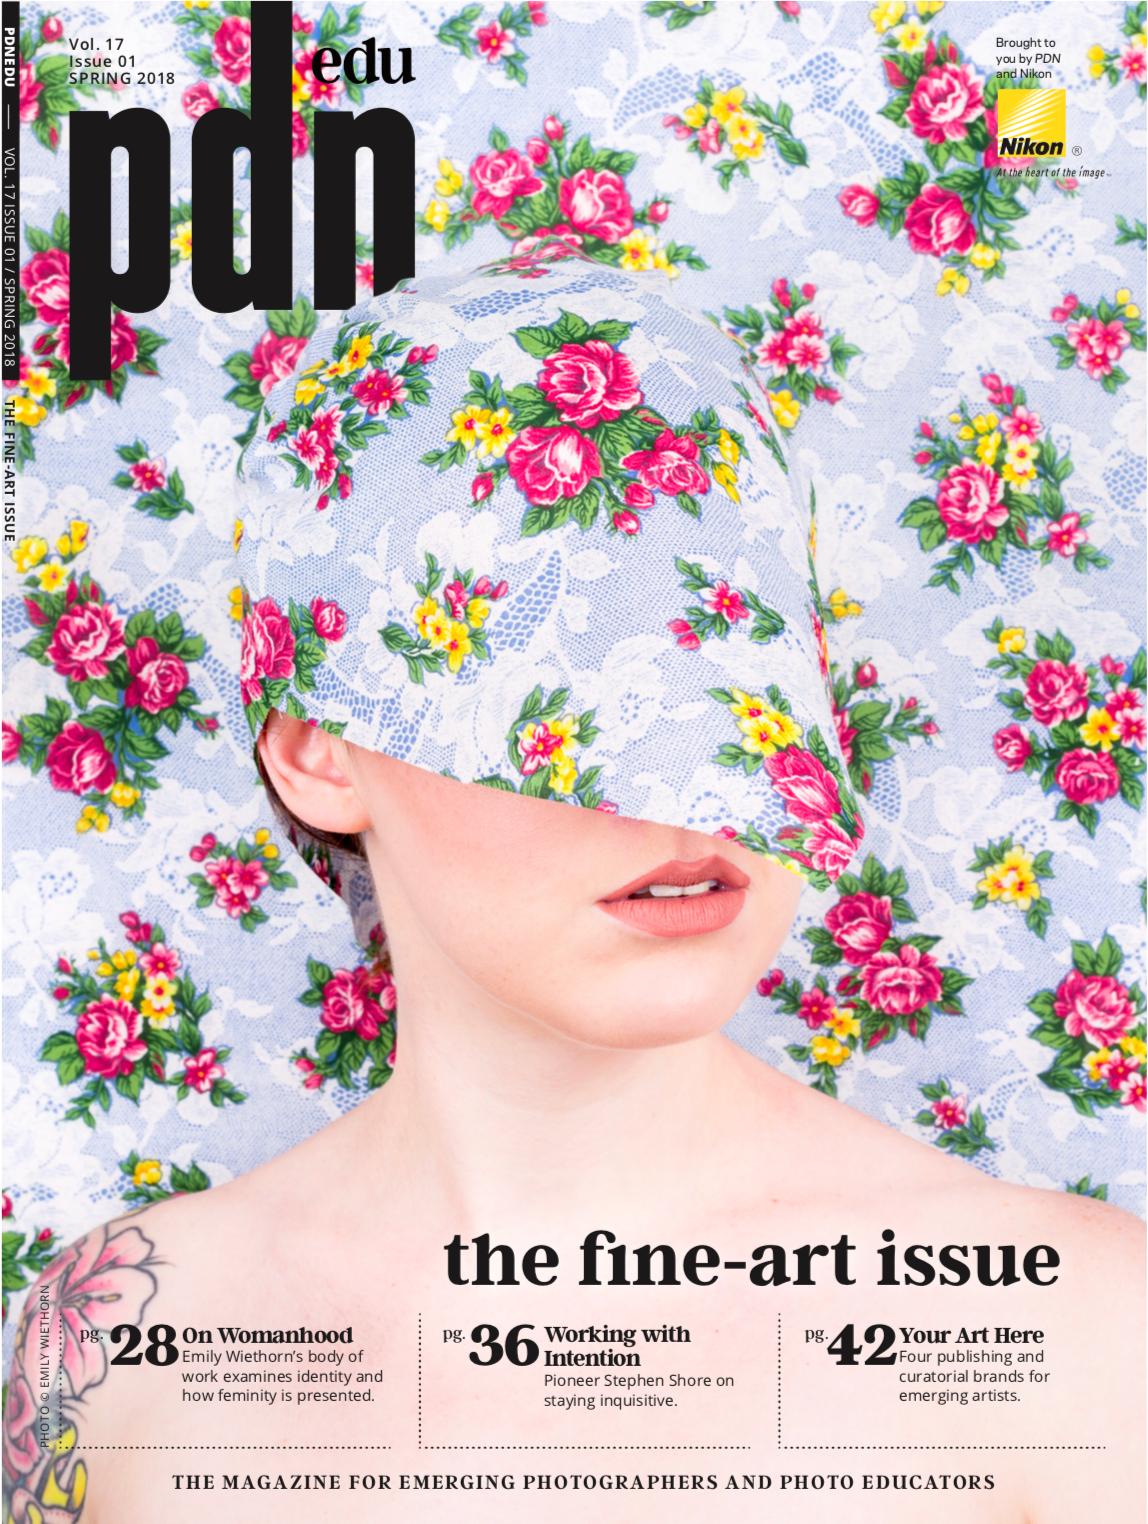 PDN EDU , Vol. 17 Issue 1 /Spring 2018